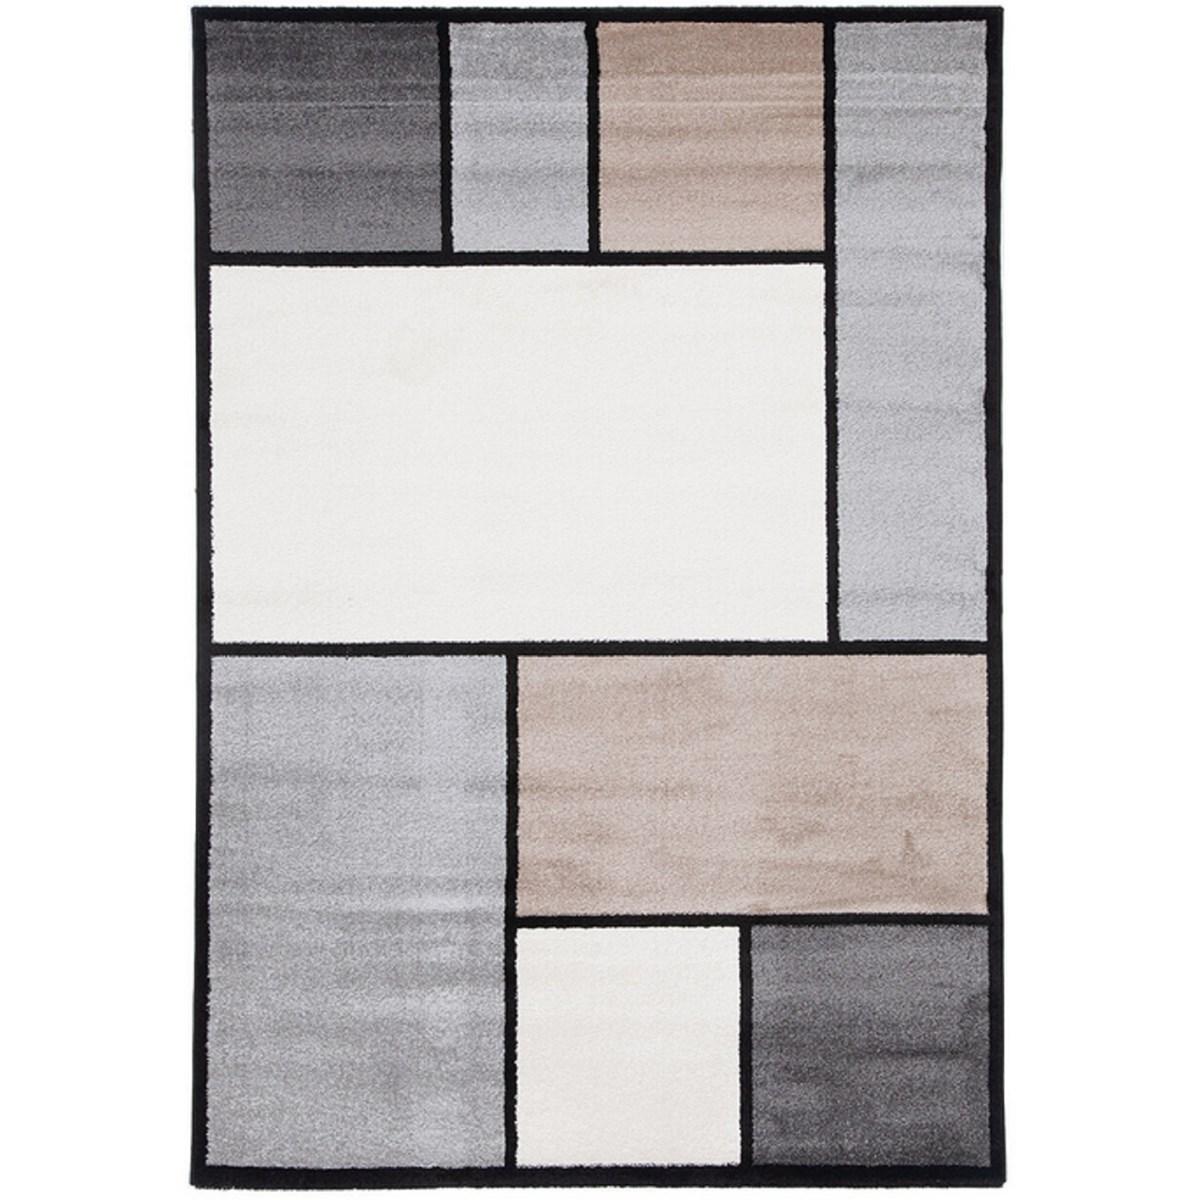 Tapis de salon en Polypropylène Beige 120x170 cm